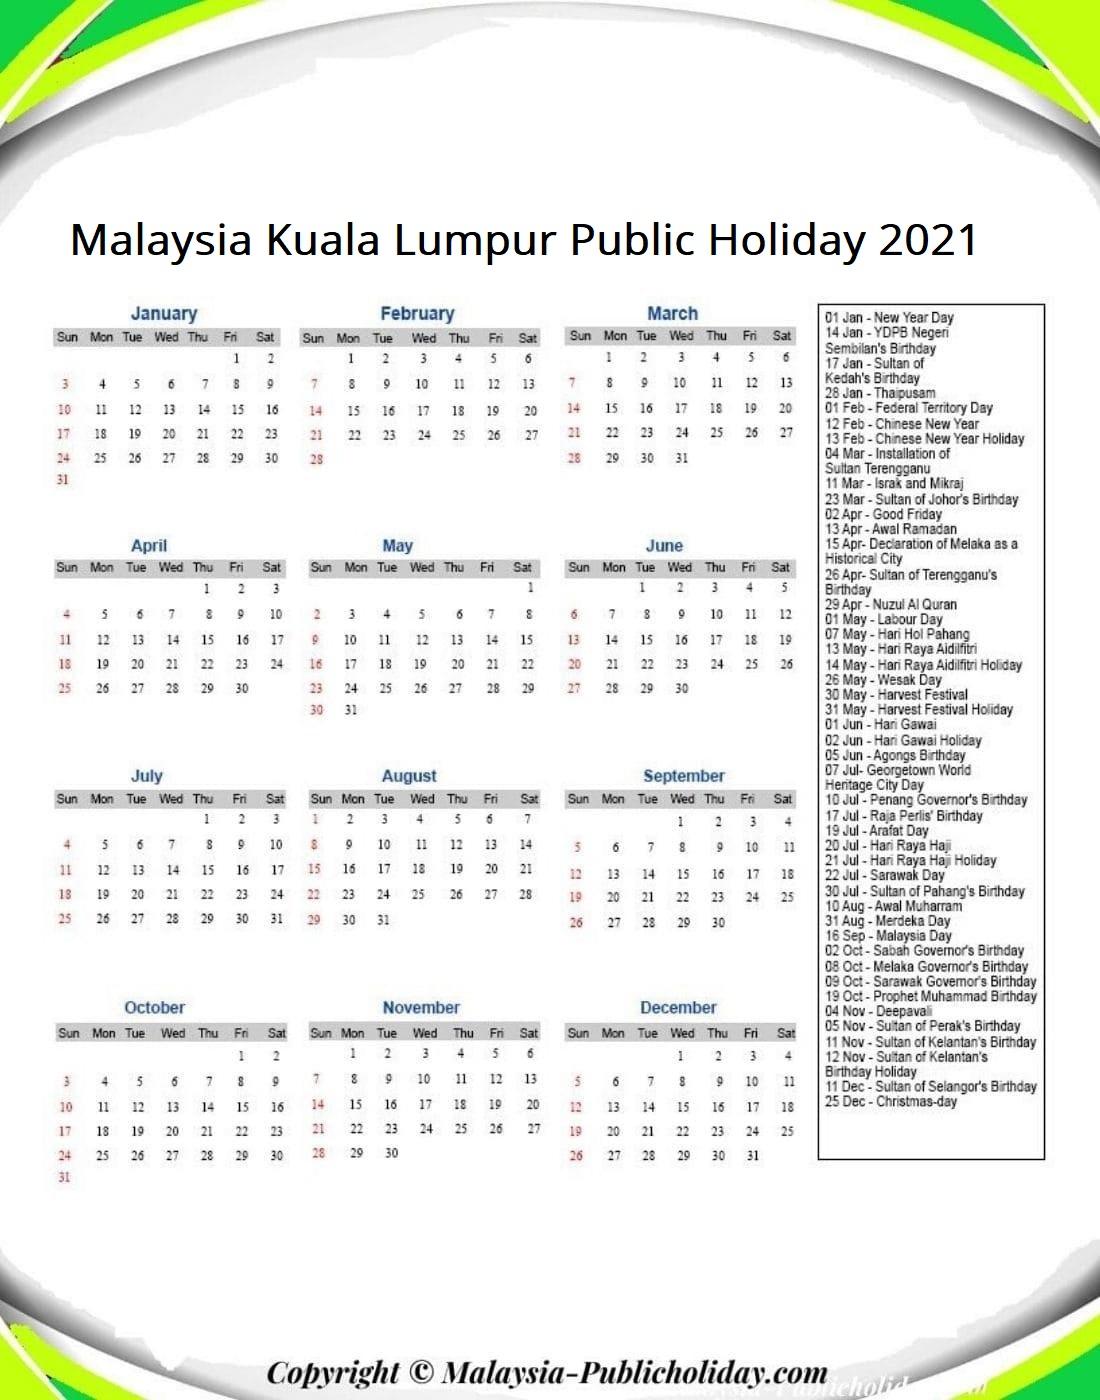 Kuala Lumpur Calendars with Holidays 2021